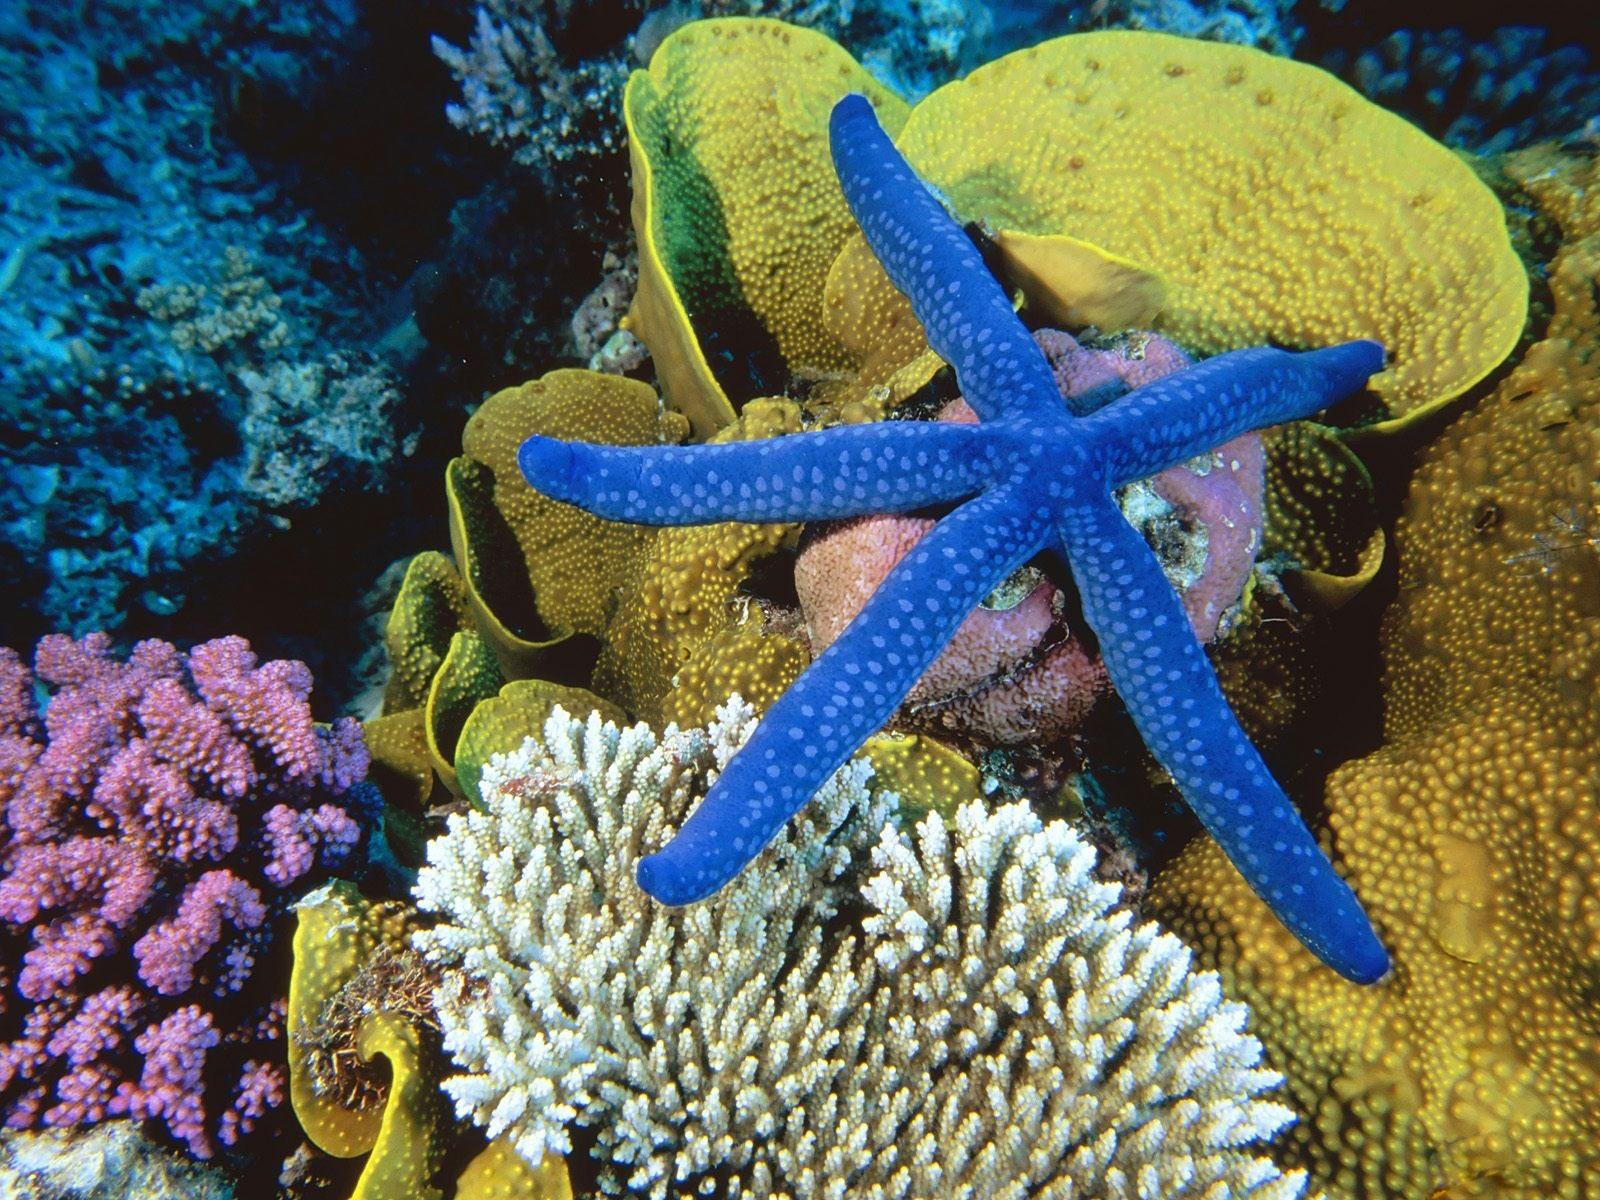 beautiful reef wallpaper